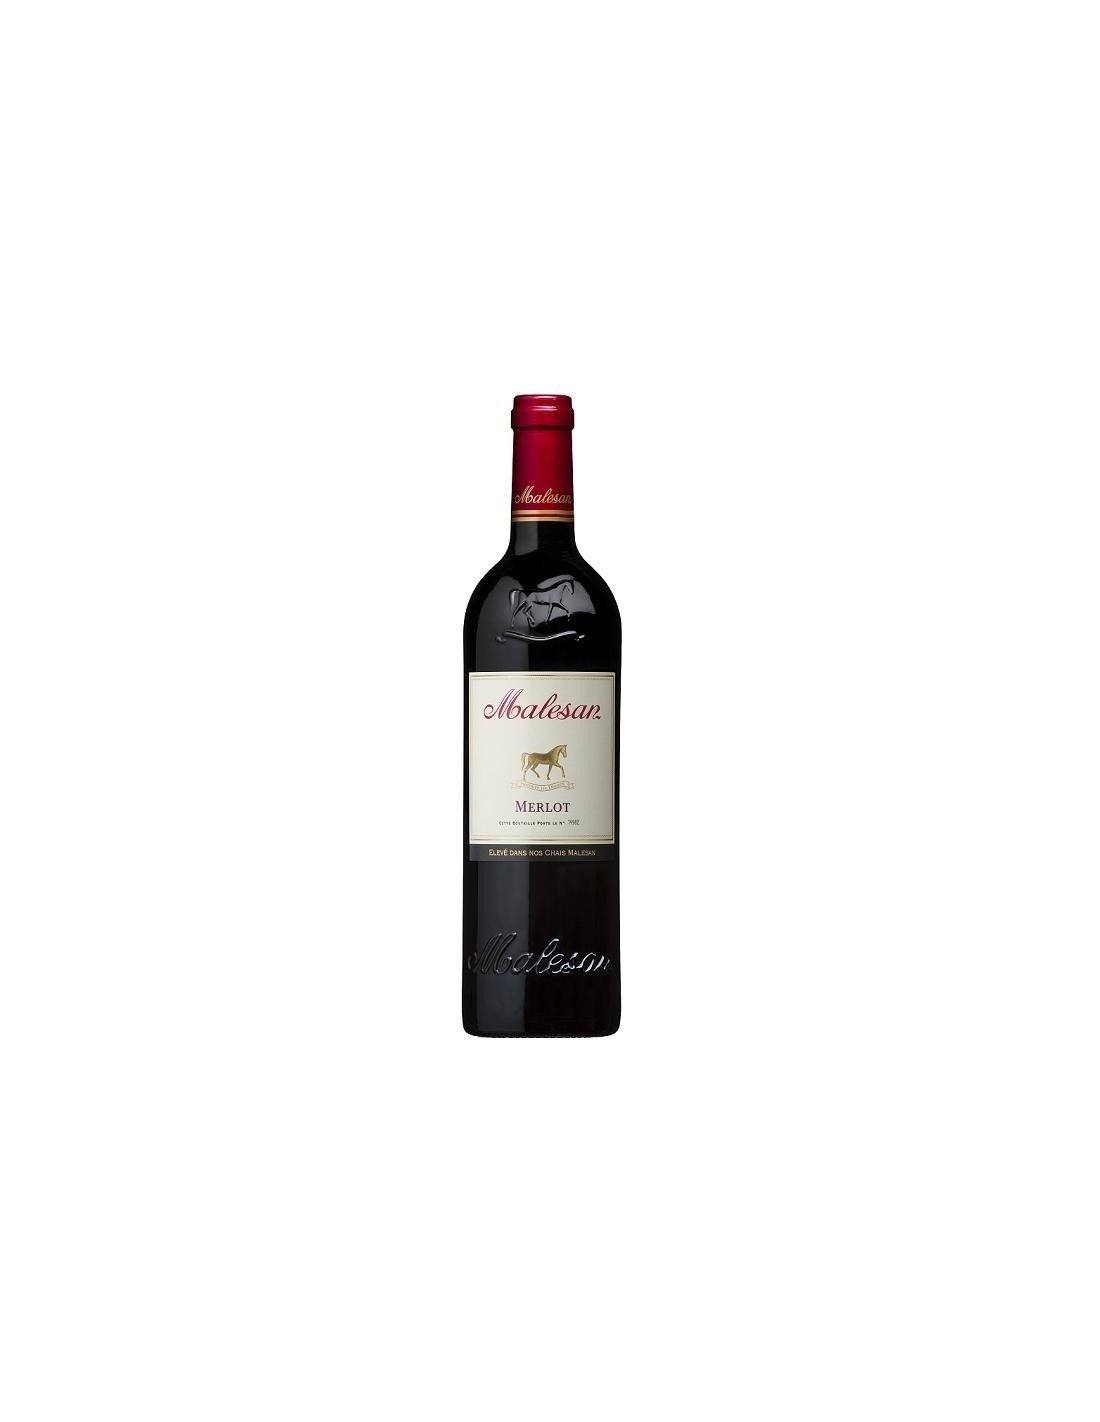 Vin rosu, Merlot, Malesan Bordeaux, 0.75L, Franta